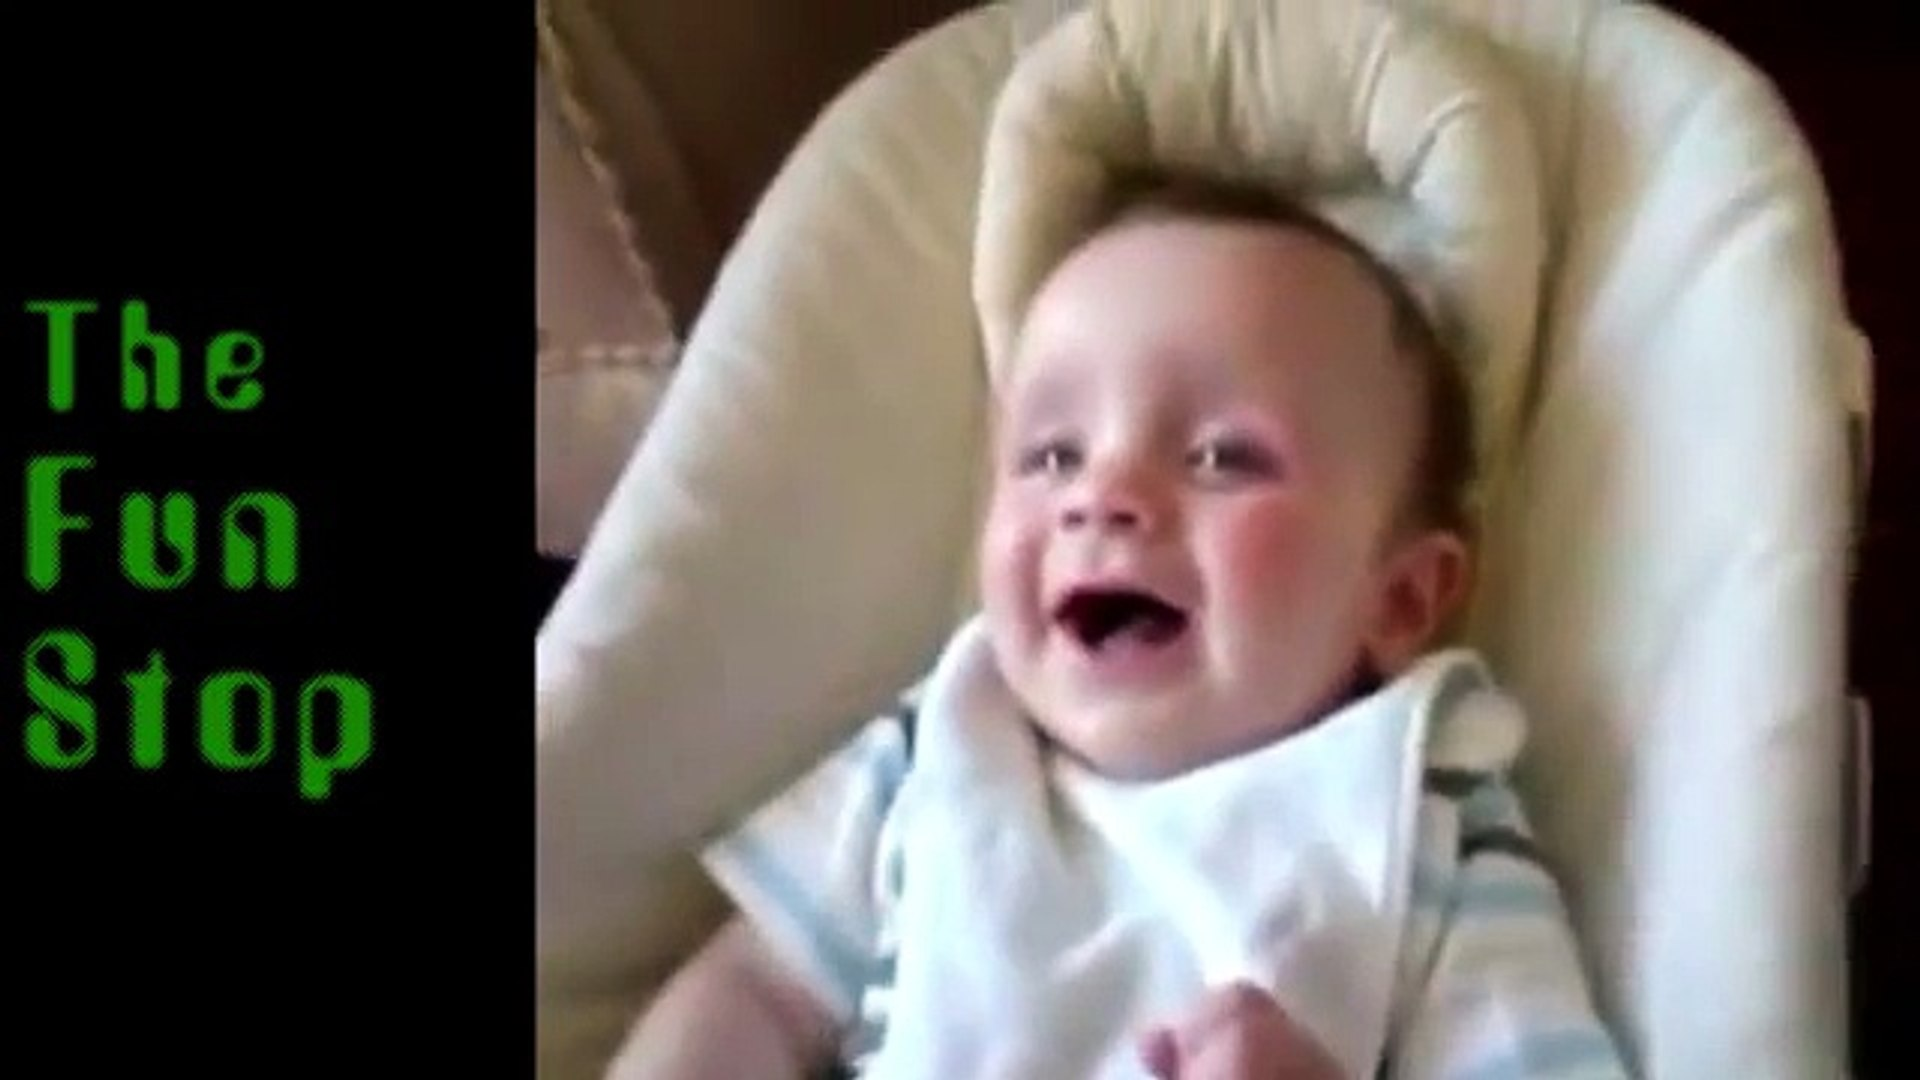 Cute Baby Videos Funny - Cute Baby